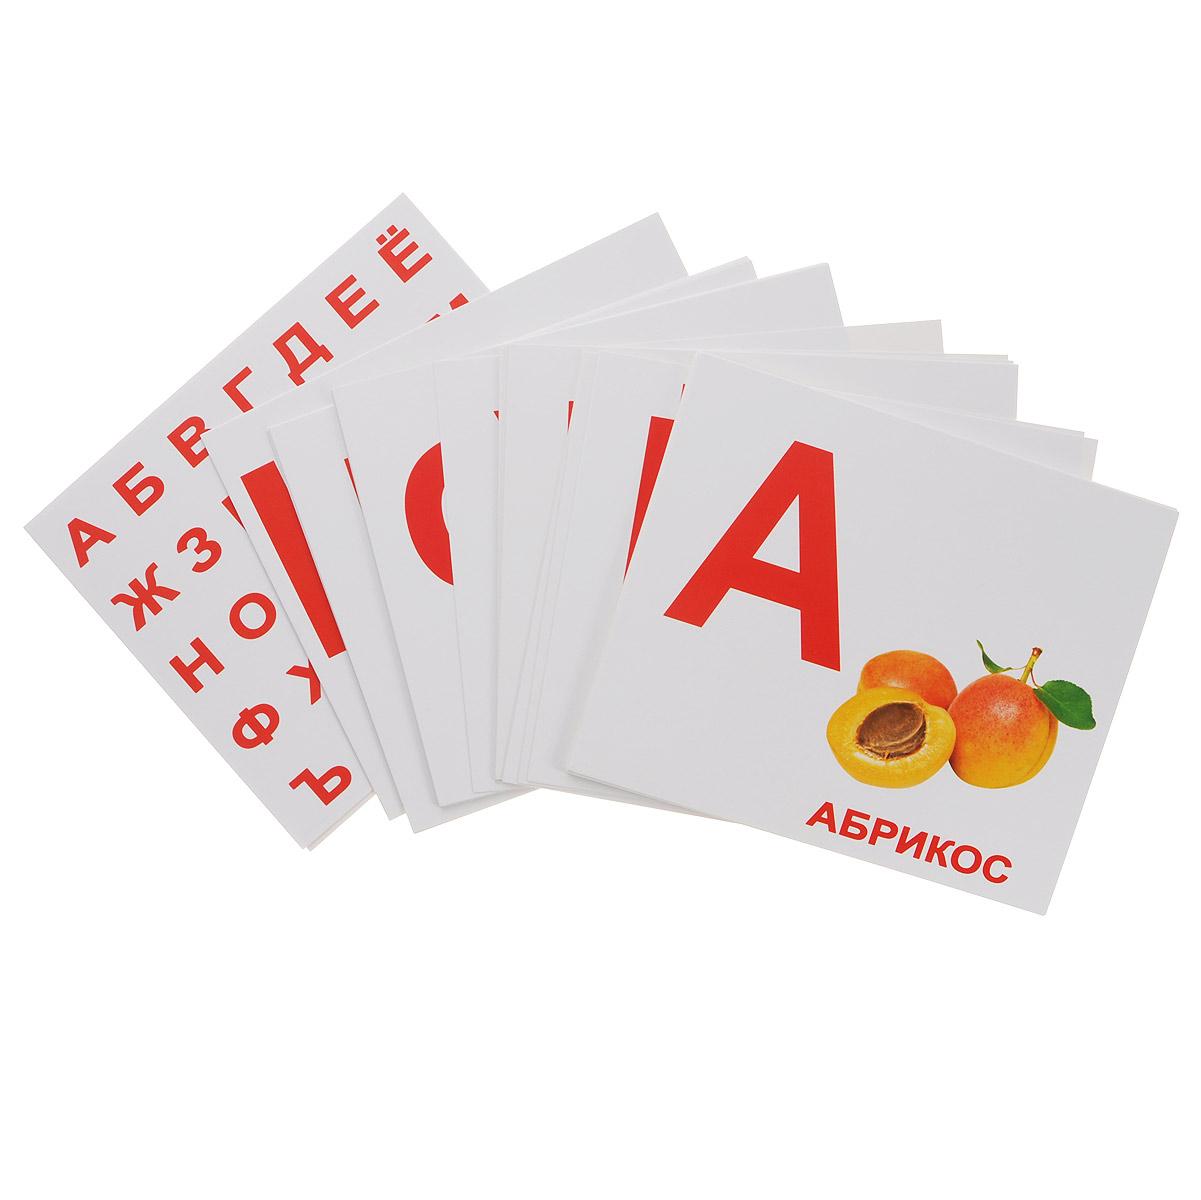 цена Обучающая игра Вундеркинд с пеленок Карточки Домана Алфавит онлайн в 2017 году